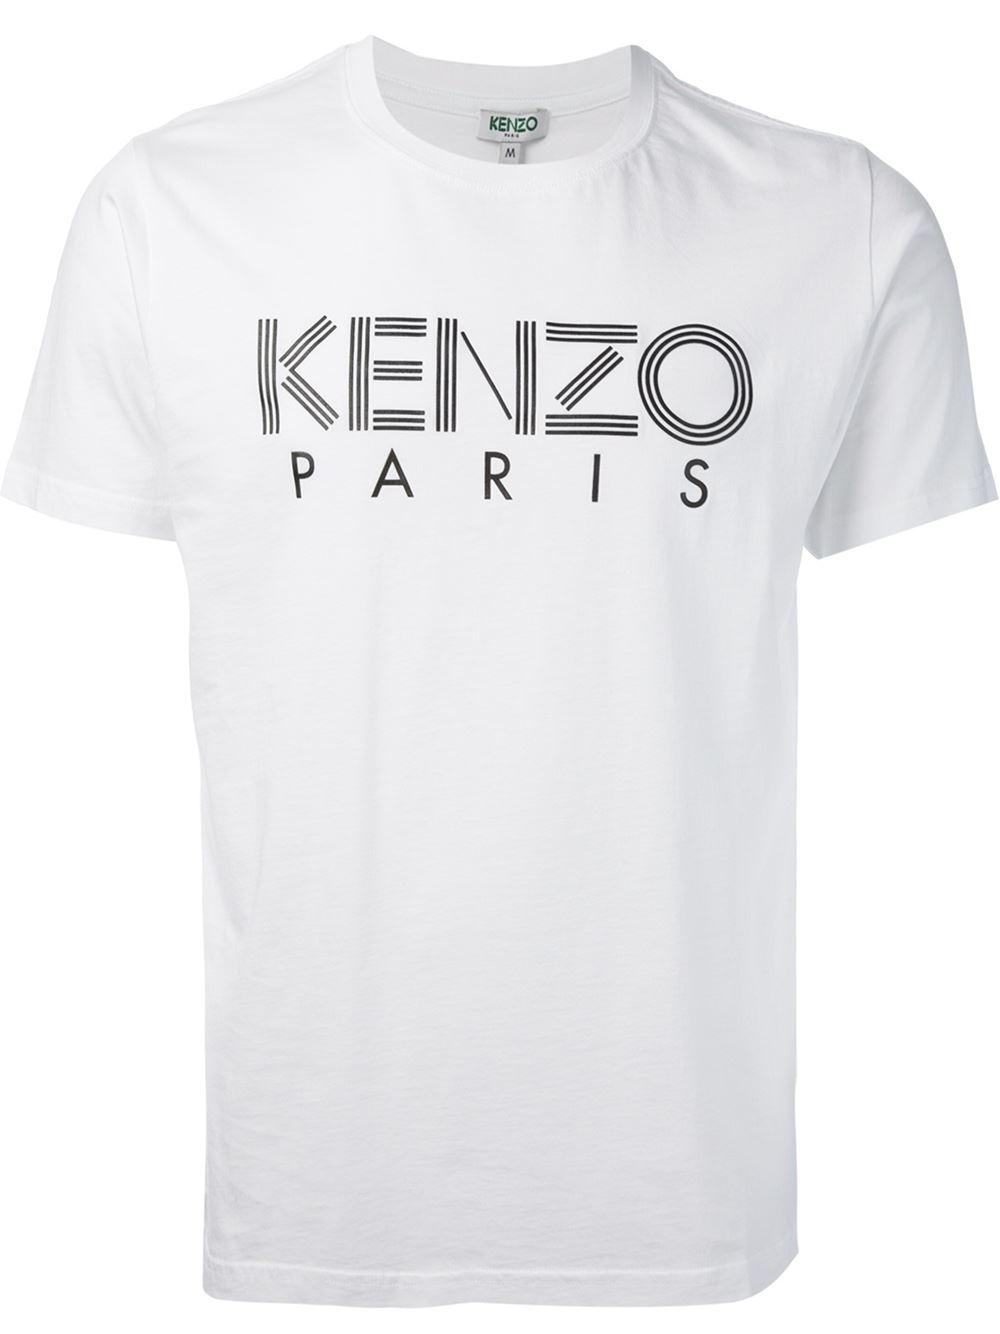 8dd2dcfb2 KENZO ' Paris' T-Shirt in White for Men - Lyst